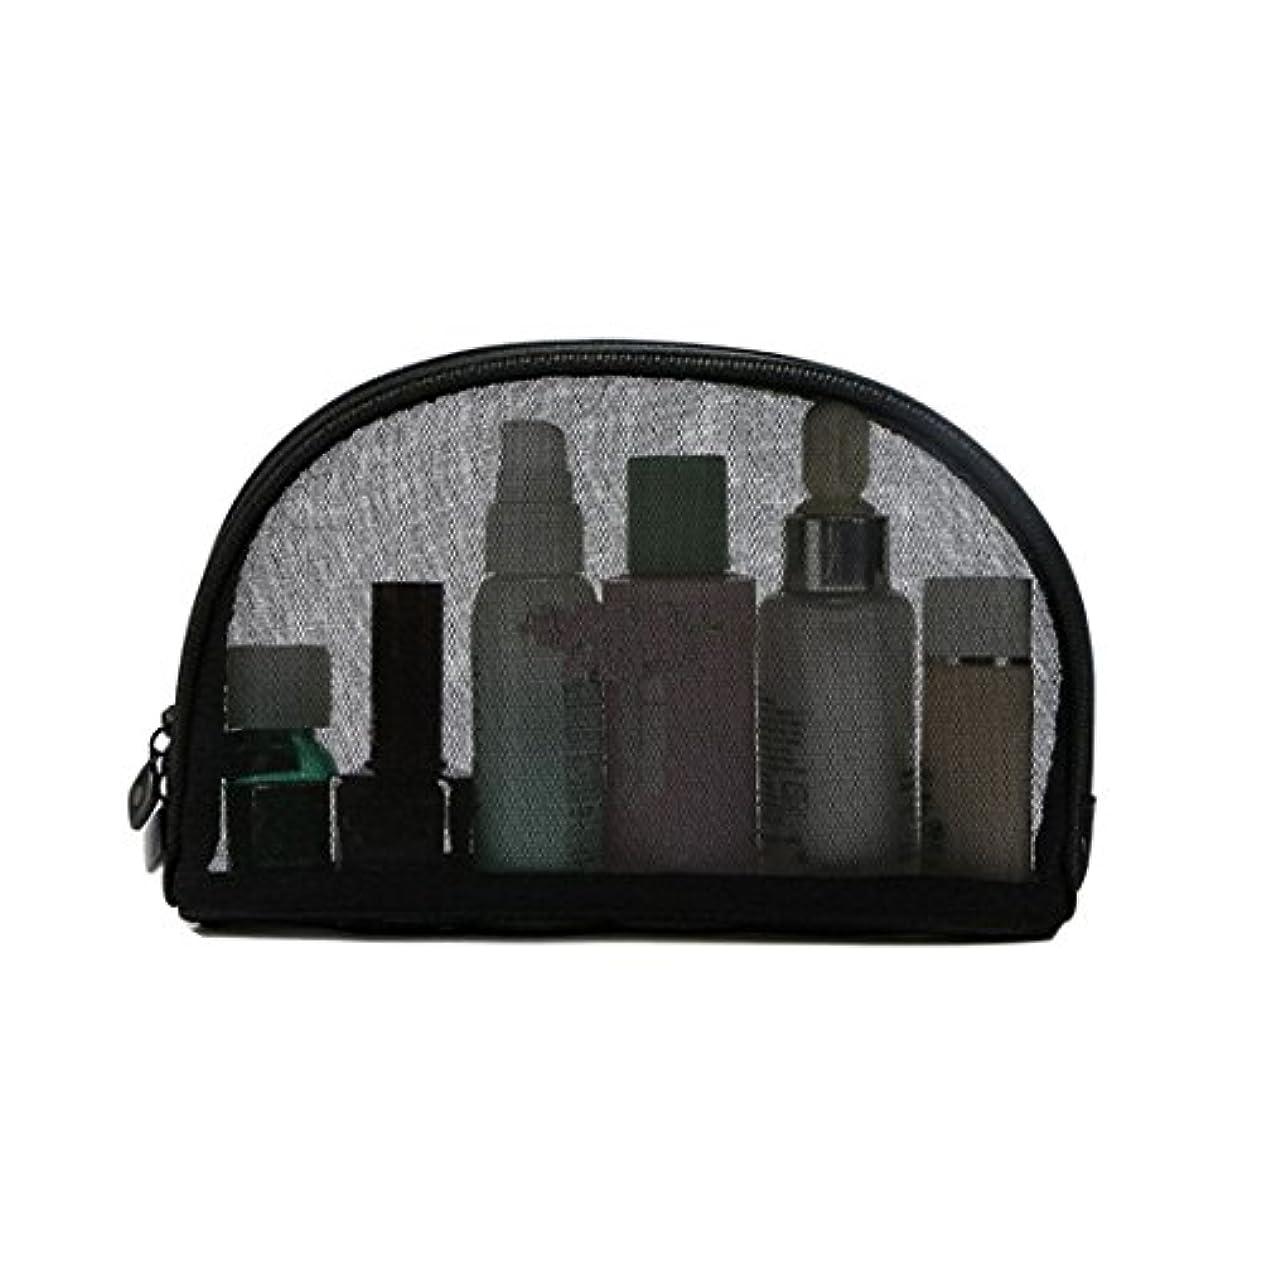 Pinji 化粧ポーチ 化粧バッグ 透明 ブラック メッシュポーチ トラベルポーチ 旅行ポーチ メイクアップバッグ ネット ポーチ レディース メンズ 小物入れ 洗面用具入れ